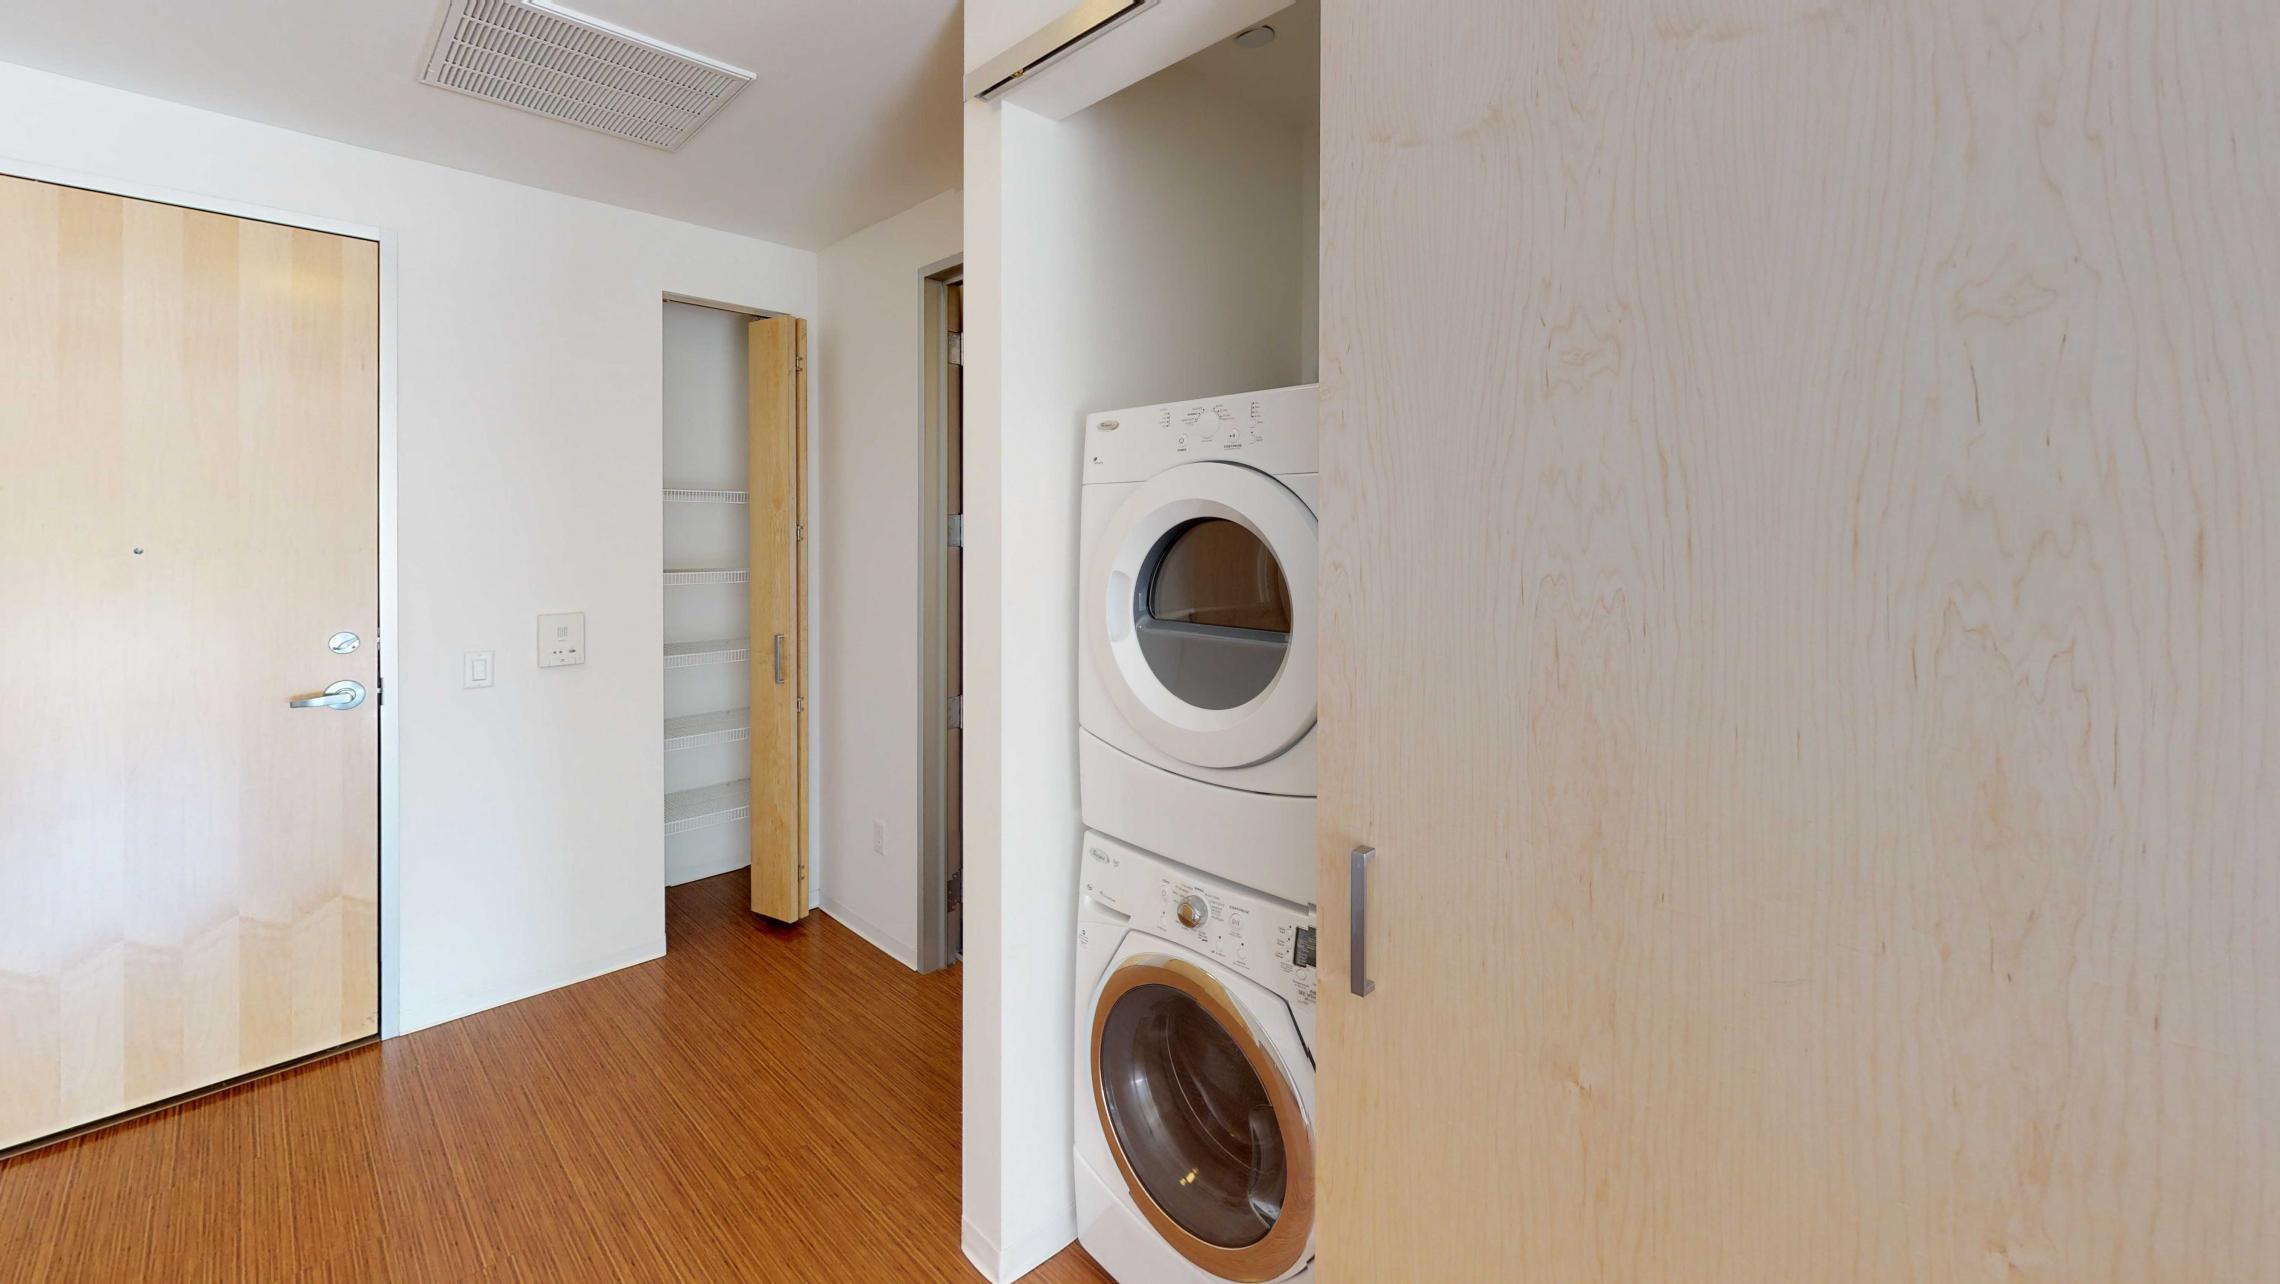 SEVEN27-Apartment-115-studio-lake view-modern-upscale-downtown-madison-patio-courtyard-laundry-closet.jpg